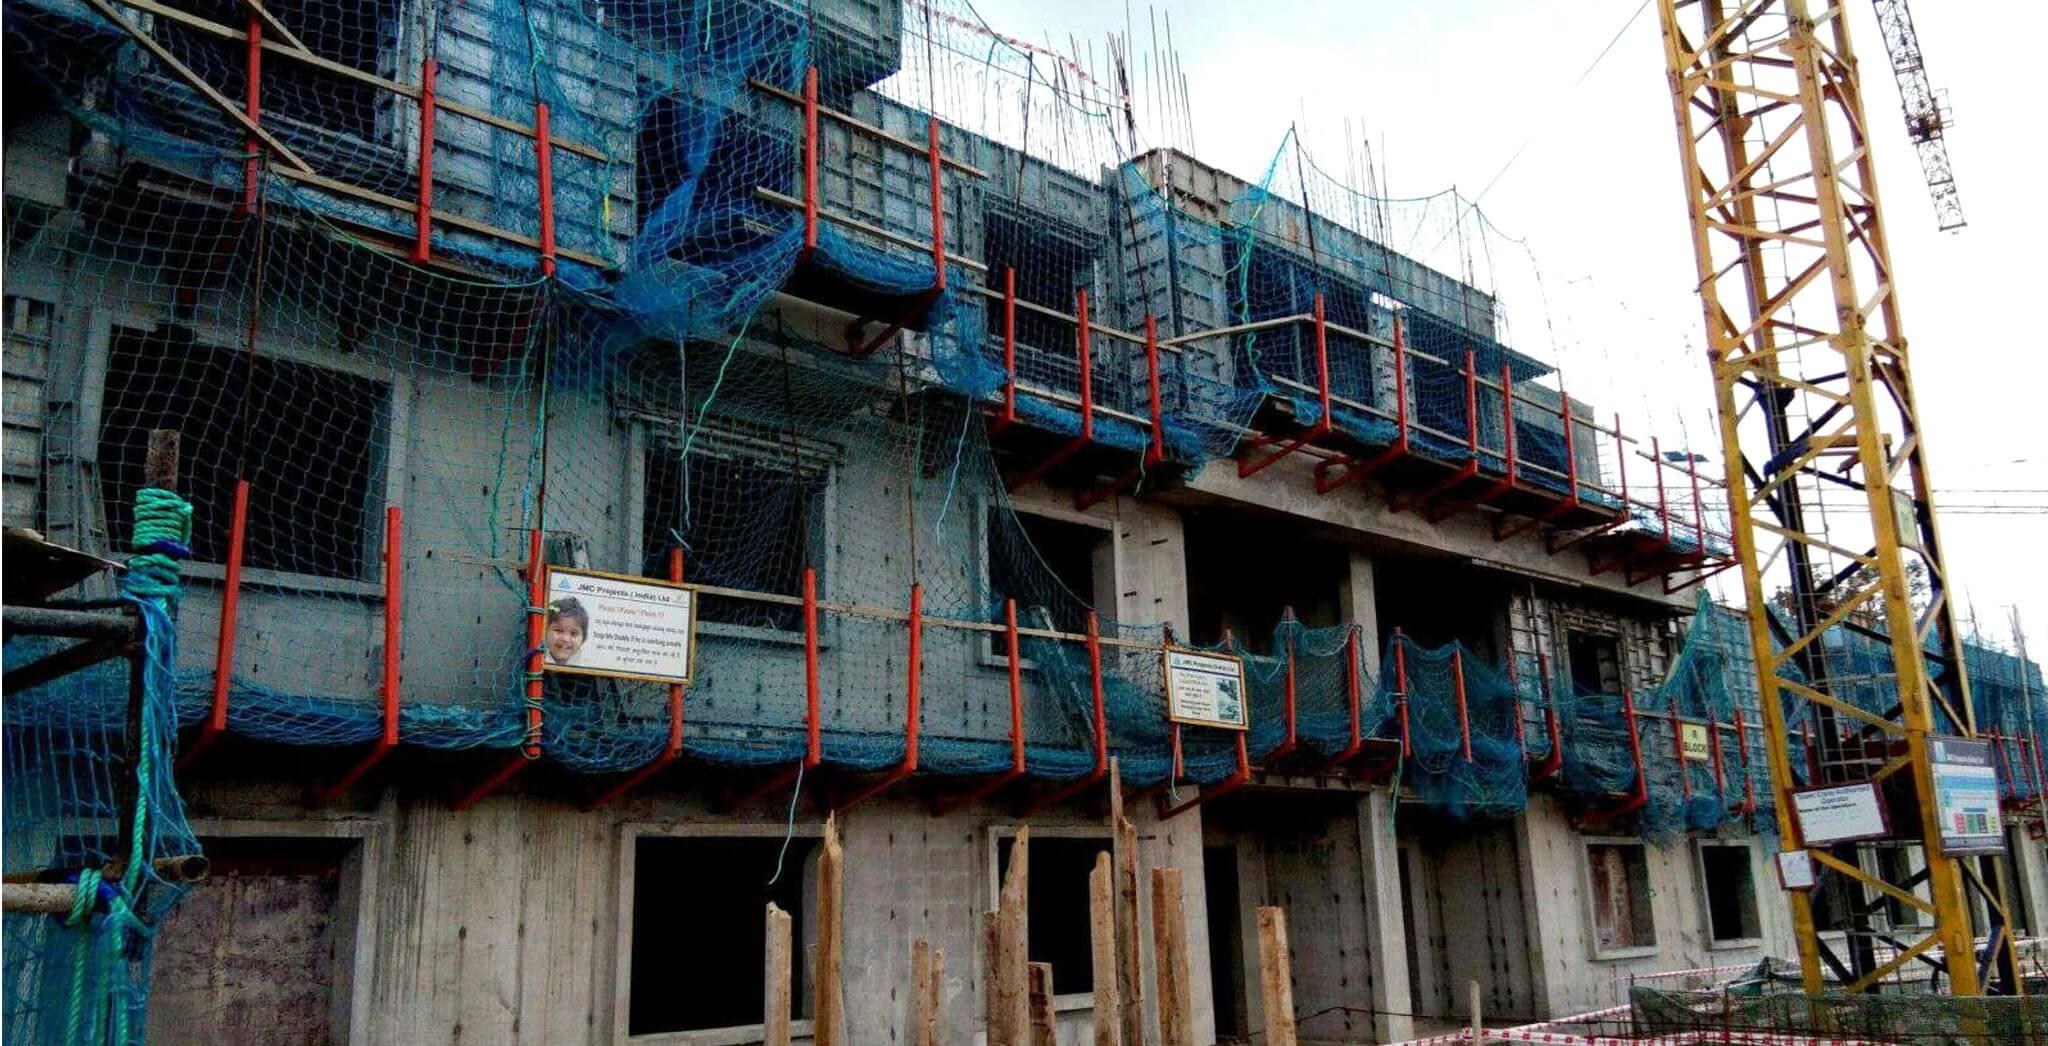 Aug 2019 - R Block: Third floor slab work-in-progress